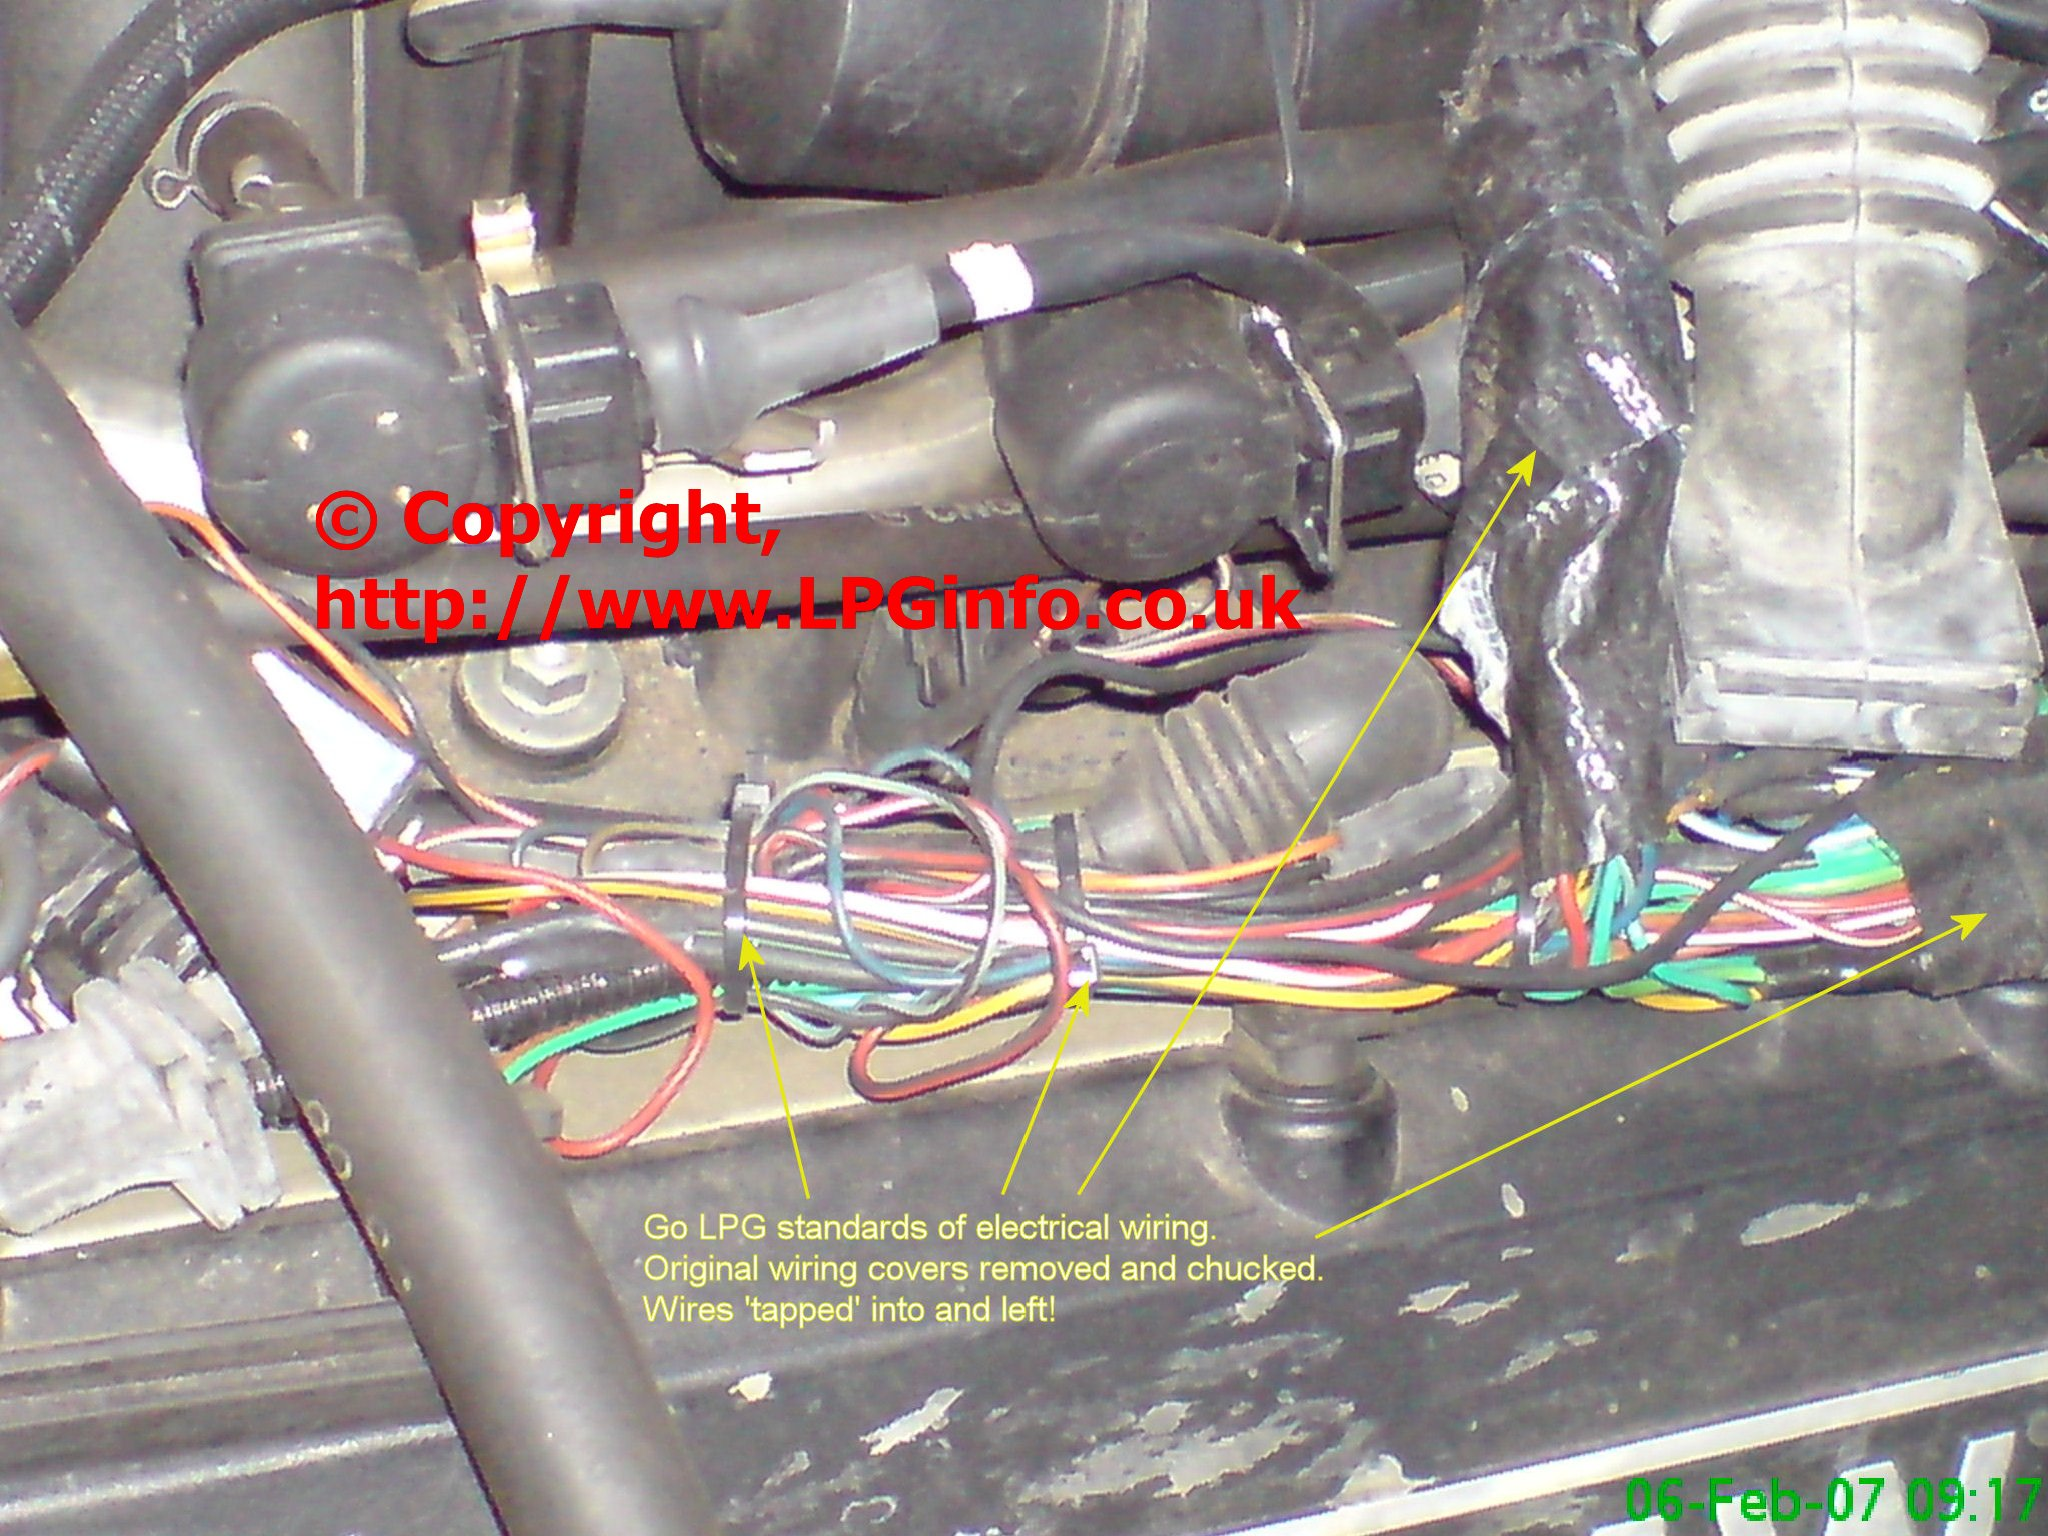 DSC00299 lpginfo co uk romano lpg wiring diagram at readyjetset.co